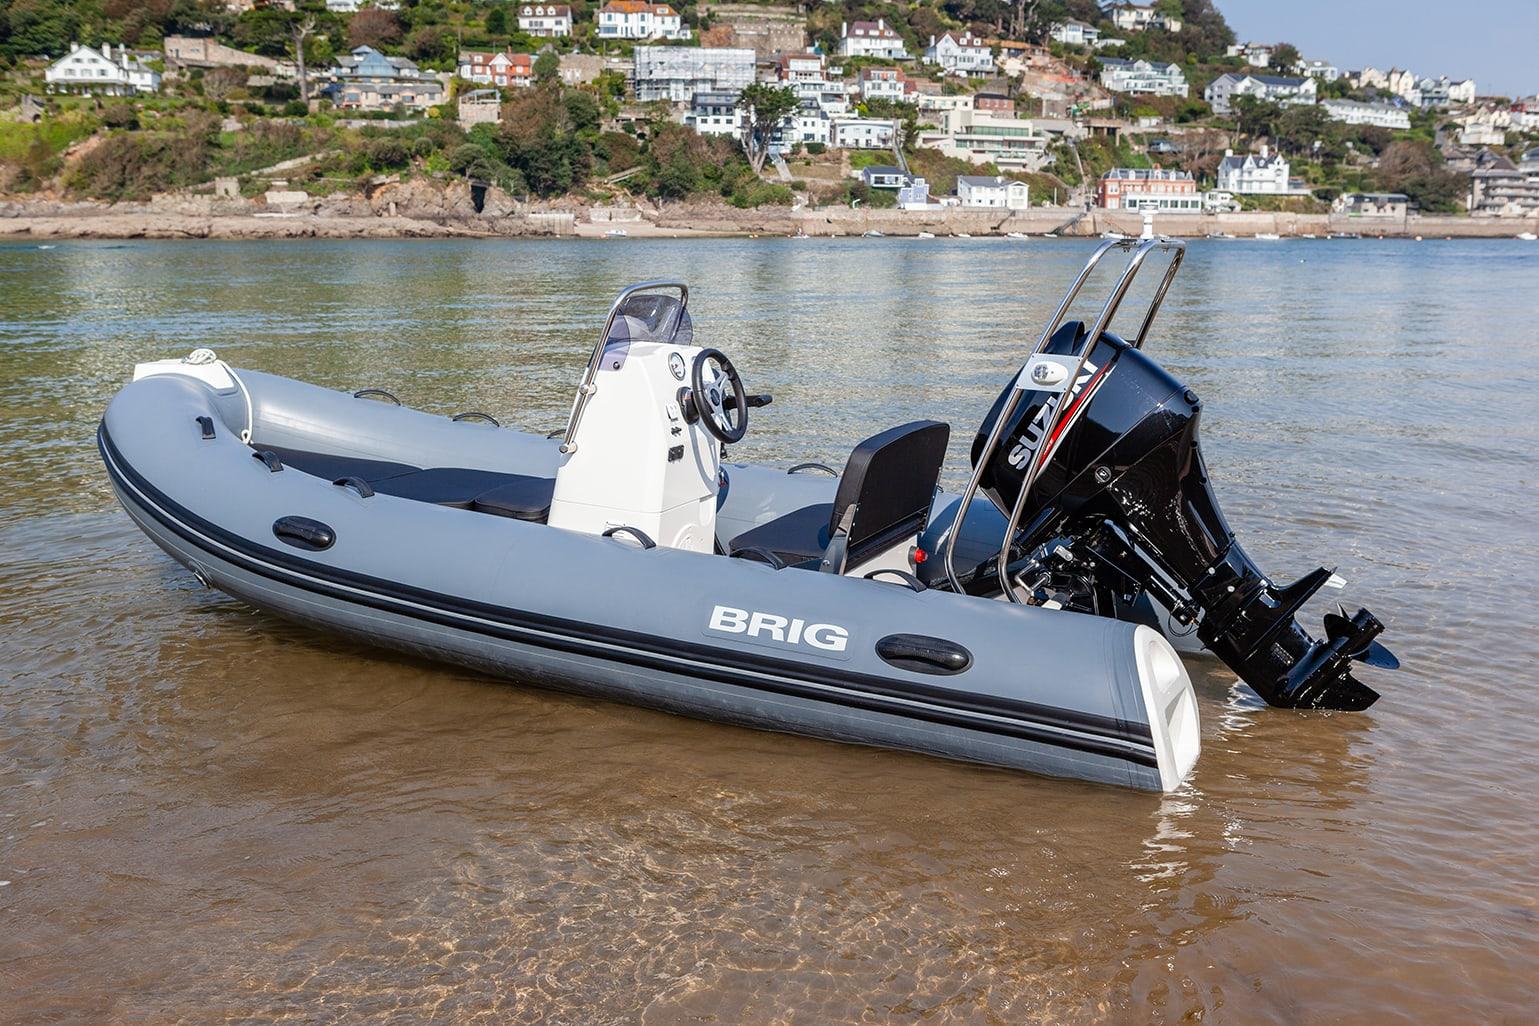 BRIG-Falcon-Rider-420HL-1539-x-1026-2